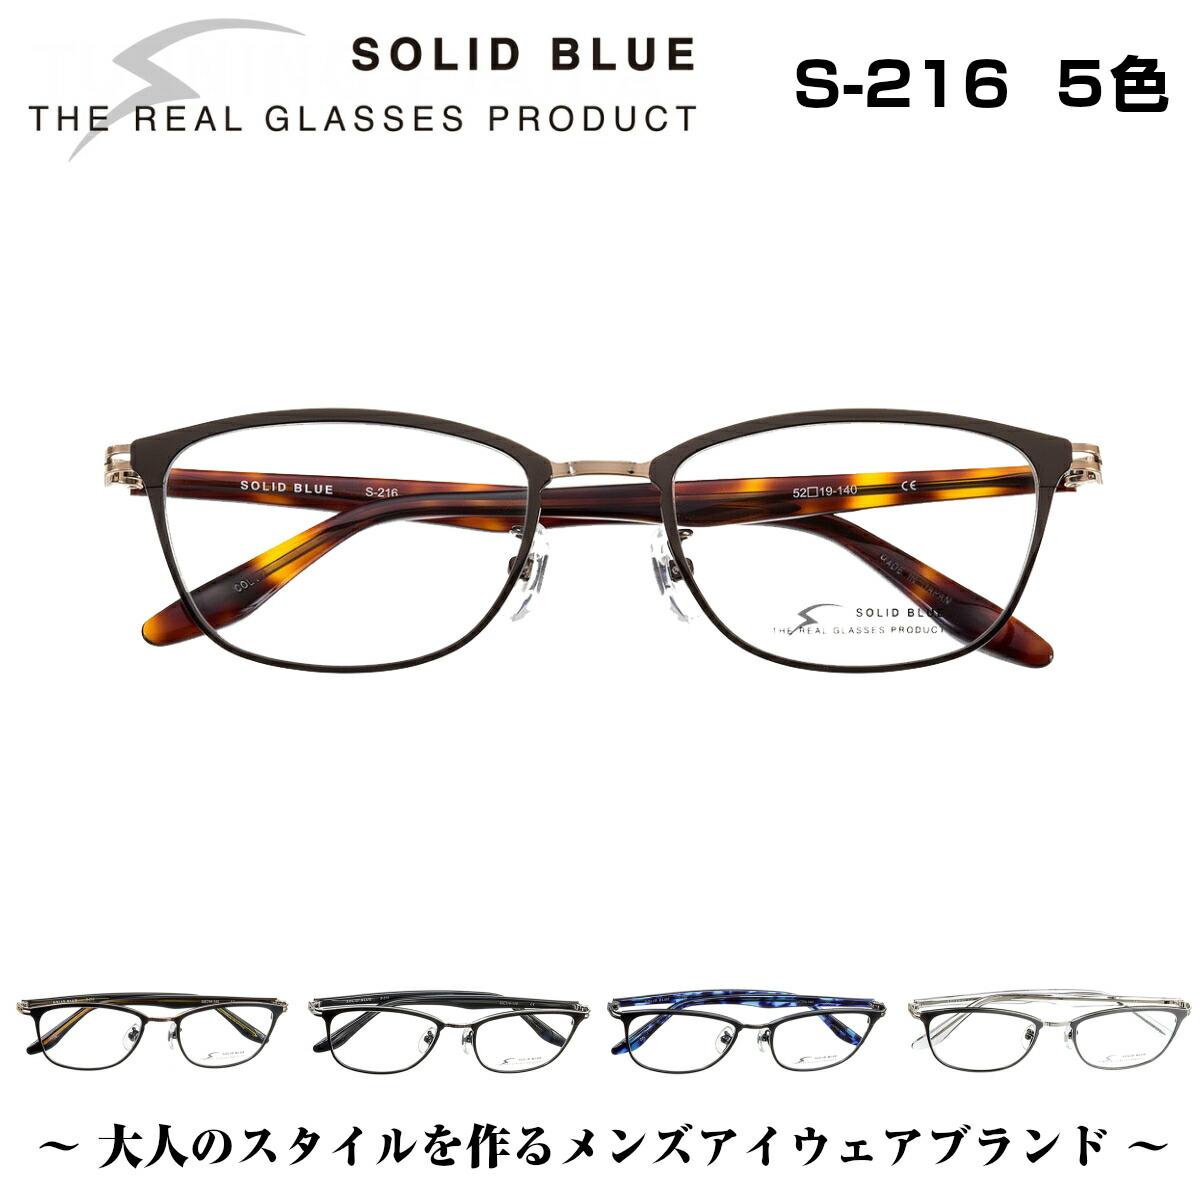 THE REAL GLASSES PRODUCT大人の男のメガネフレームソリッドブルー SOLID BLUE S-216 ソリッドブルー 5色 男性 高い素材 メンズ ビジネス フォーマル カジュアル セル 国産 軽い 眼鏡 スクエア コンビネーション めがね フレーム オリジナル 日本製 メガネ メタル チタン 正規品 鯖江 軽量